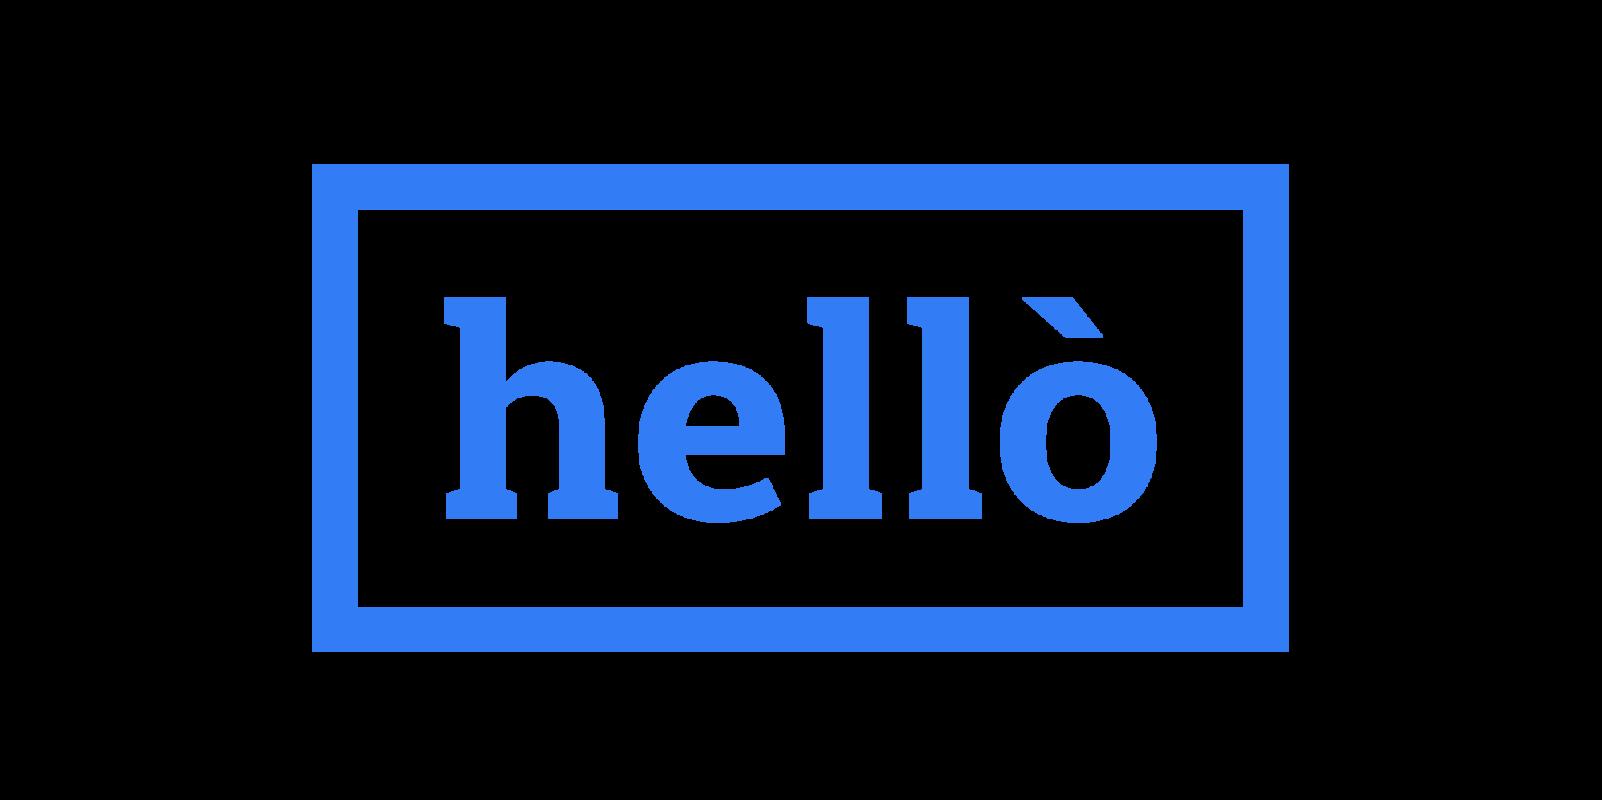 Hellò